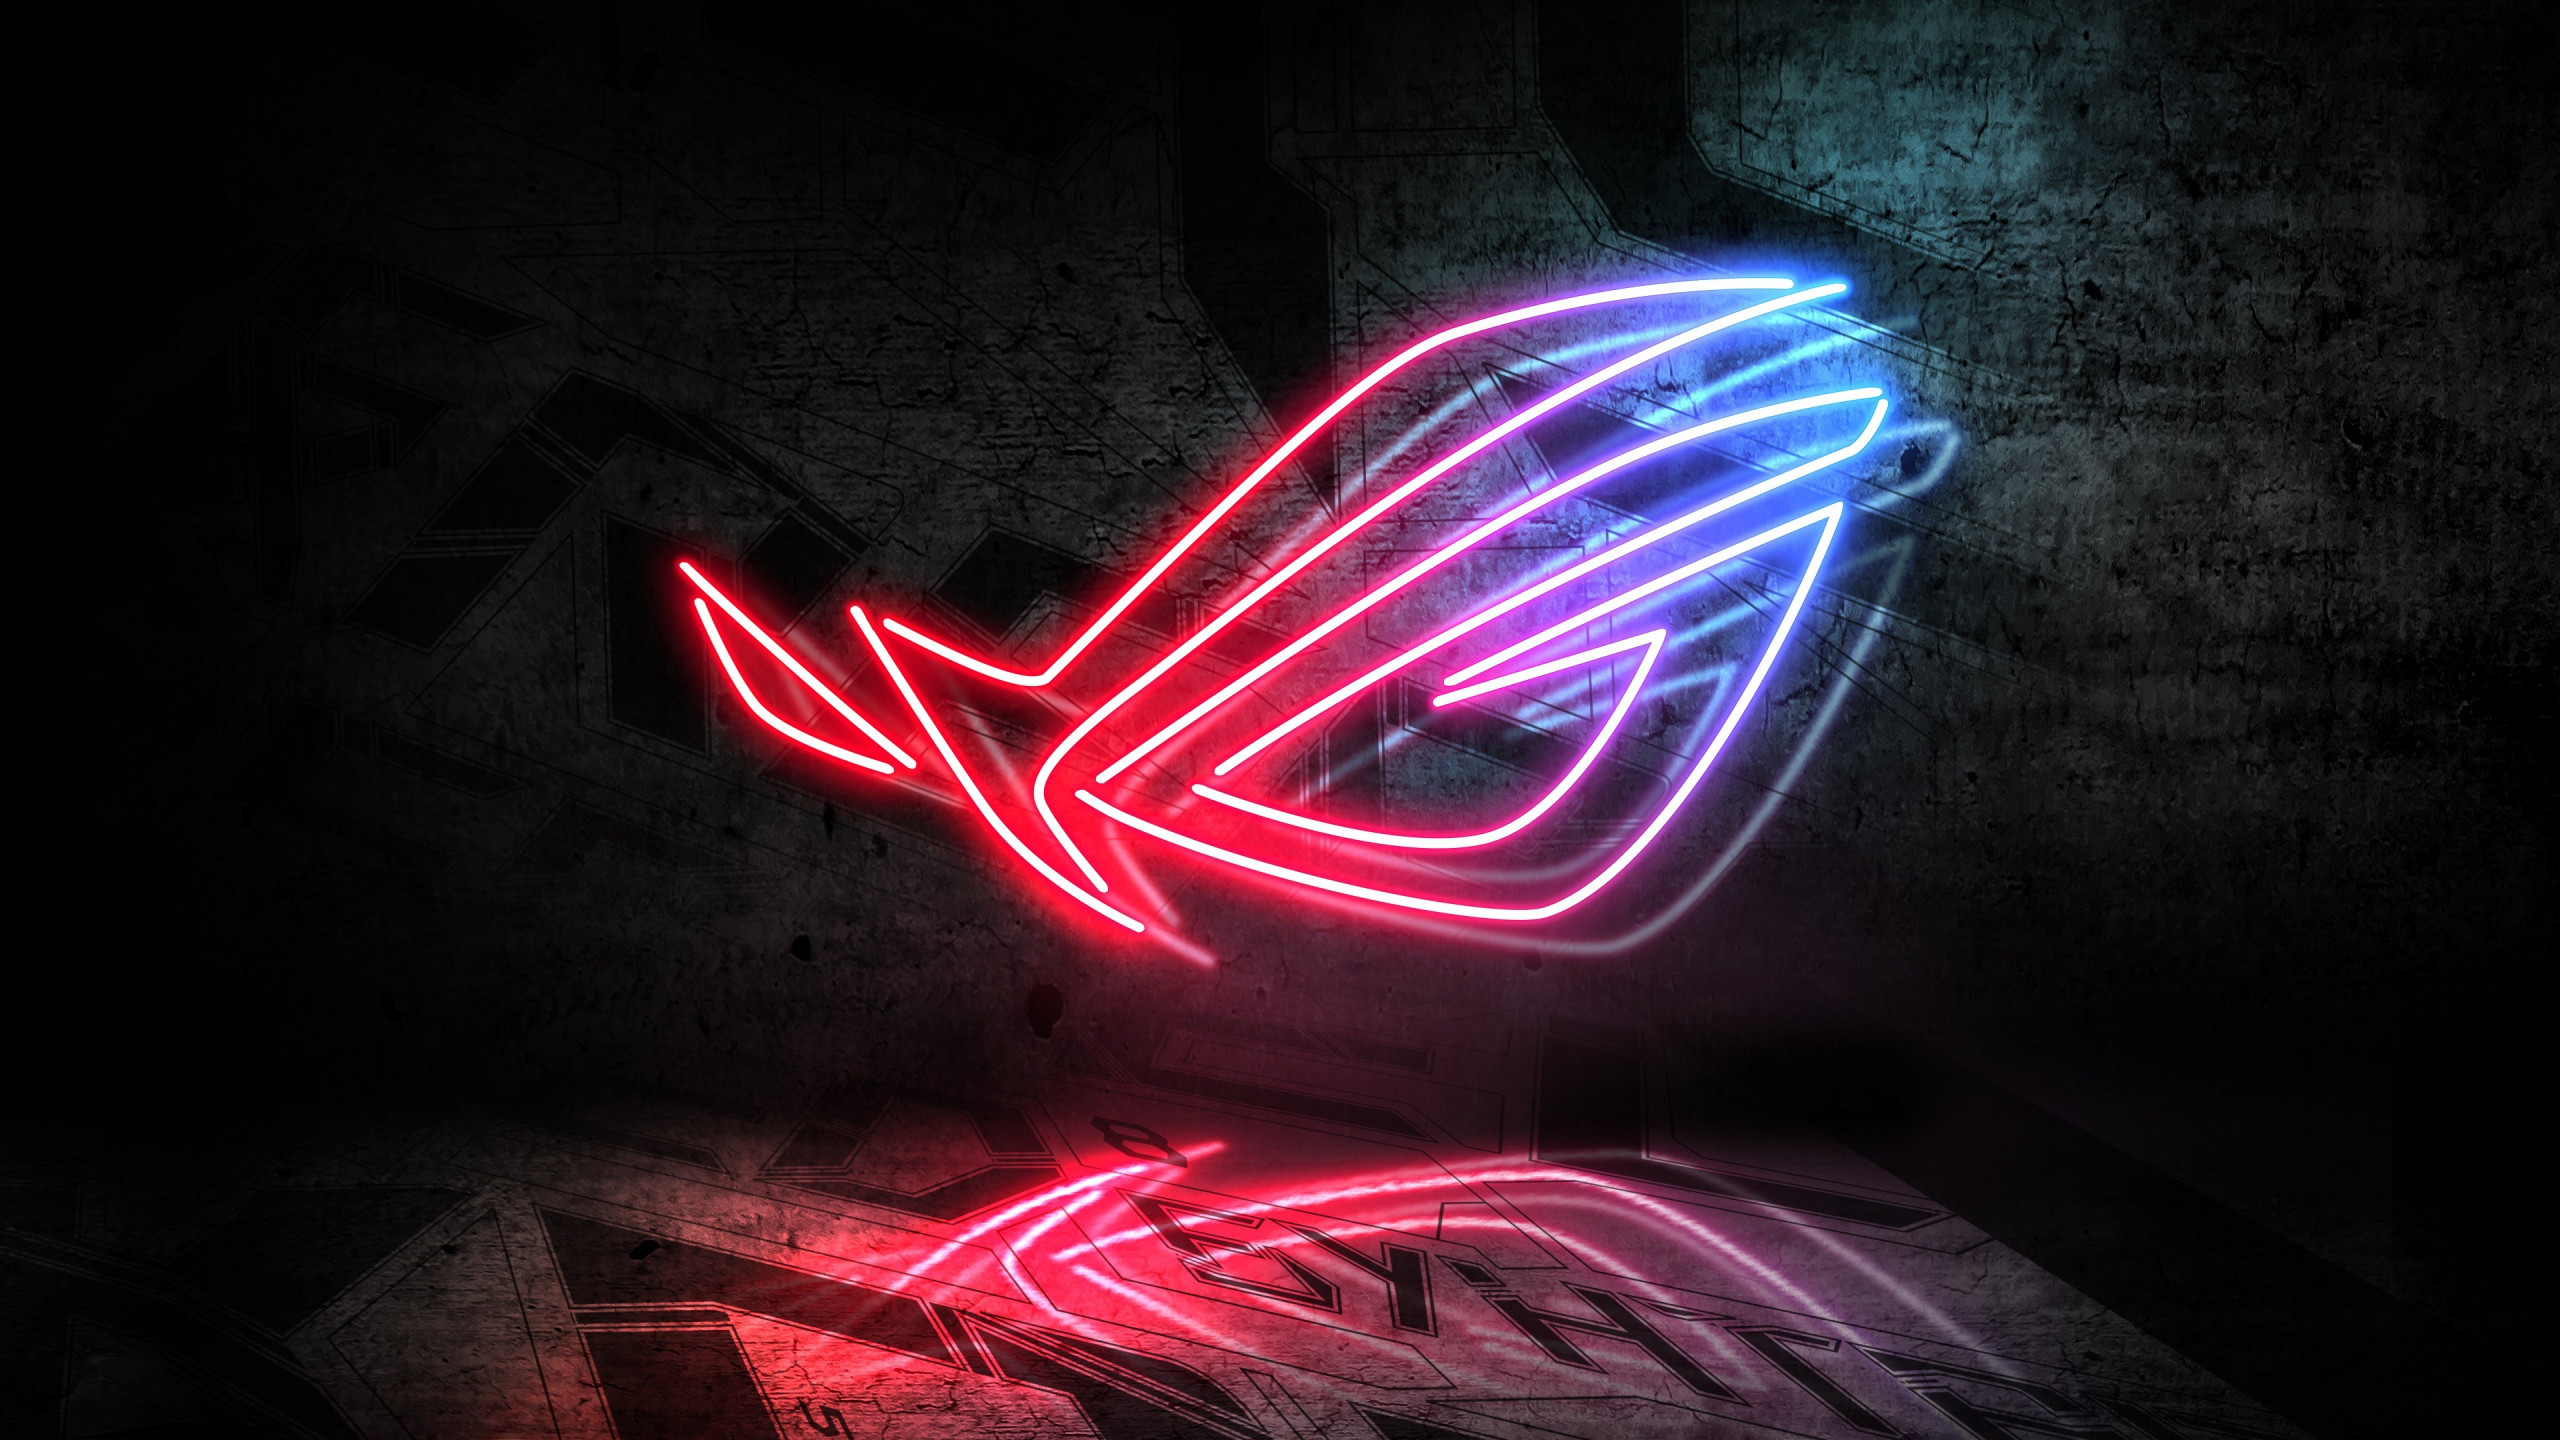 Asus ROG neon logo | 2560x1440 wallpaper